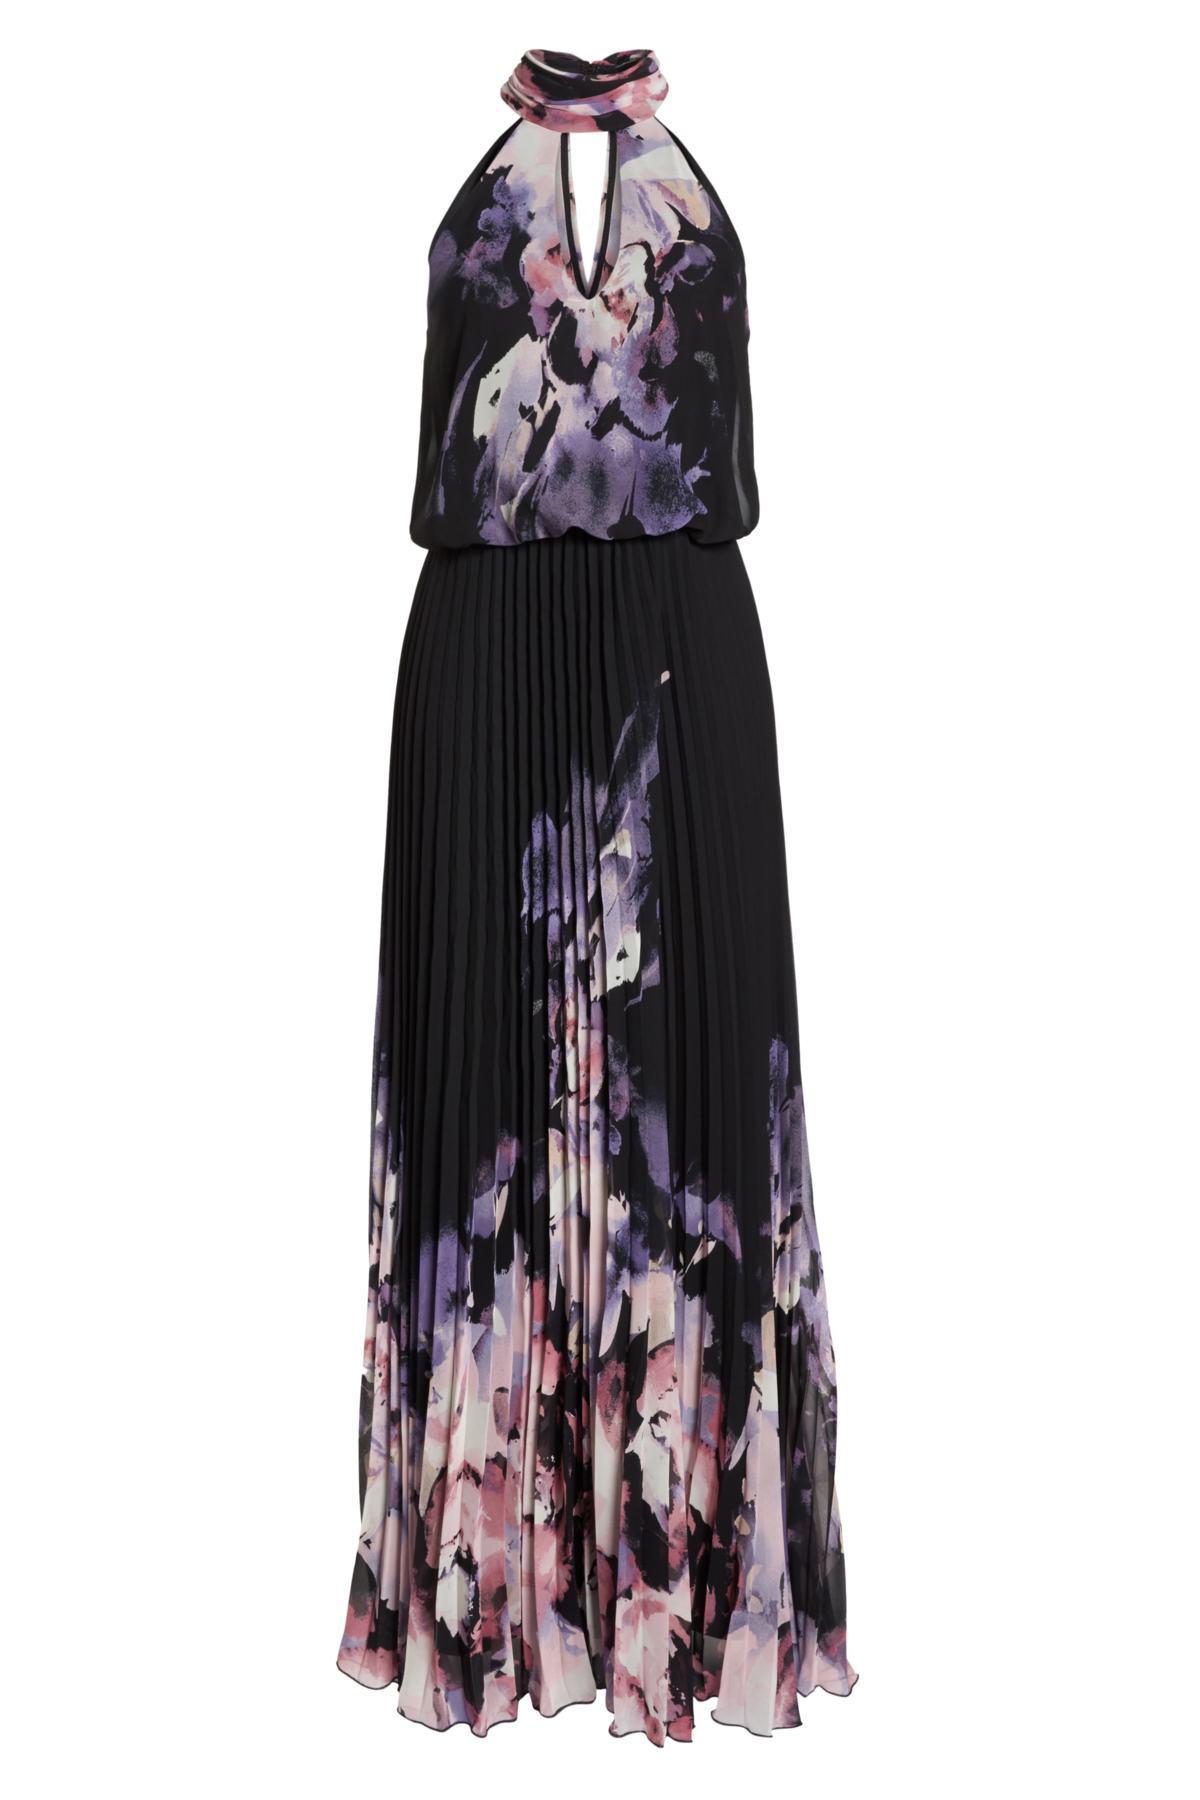 81e665784df07 Lyst - Xscape Pleated Halter Neck Chiffon Gown